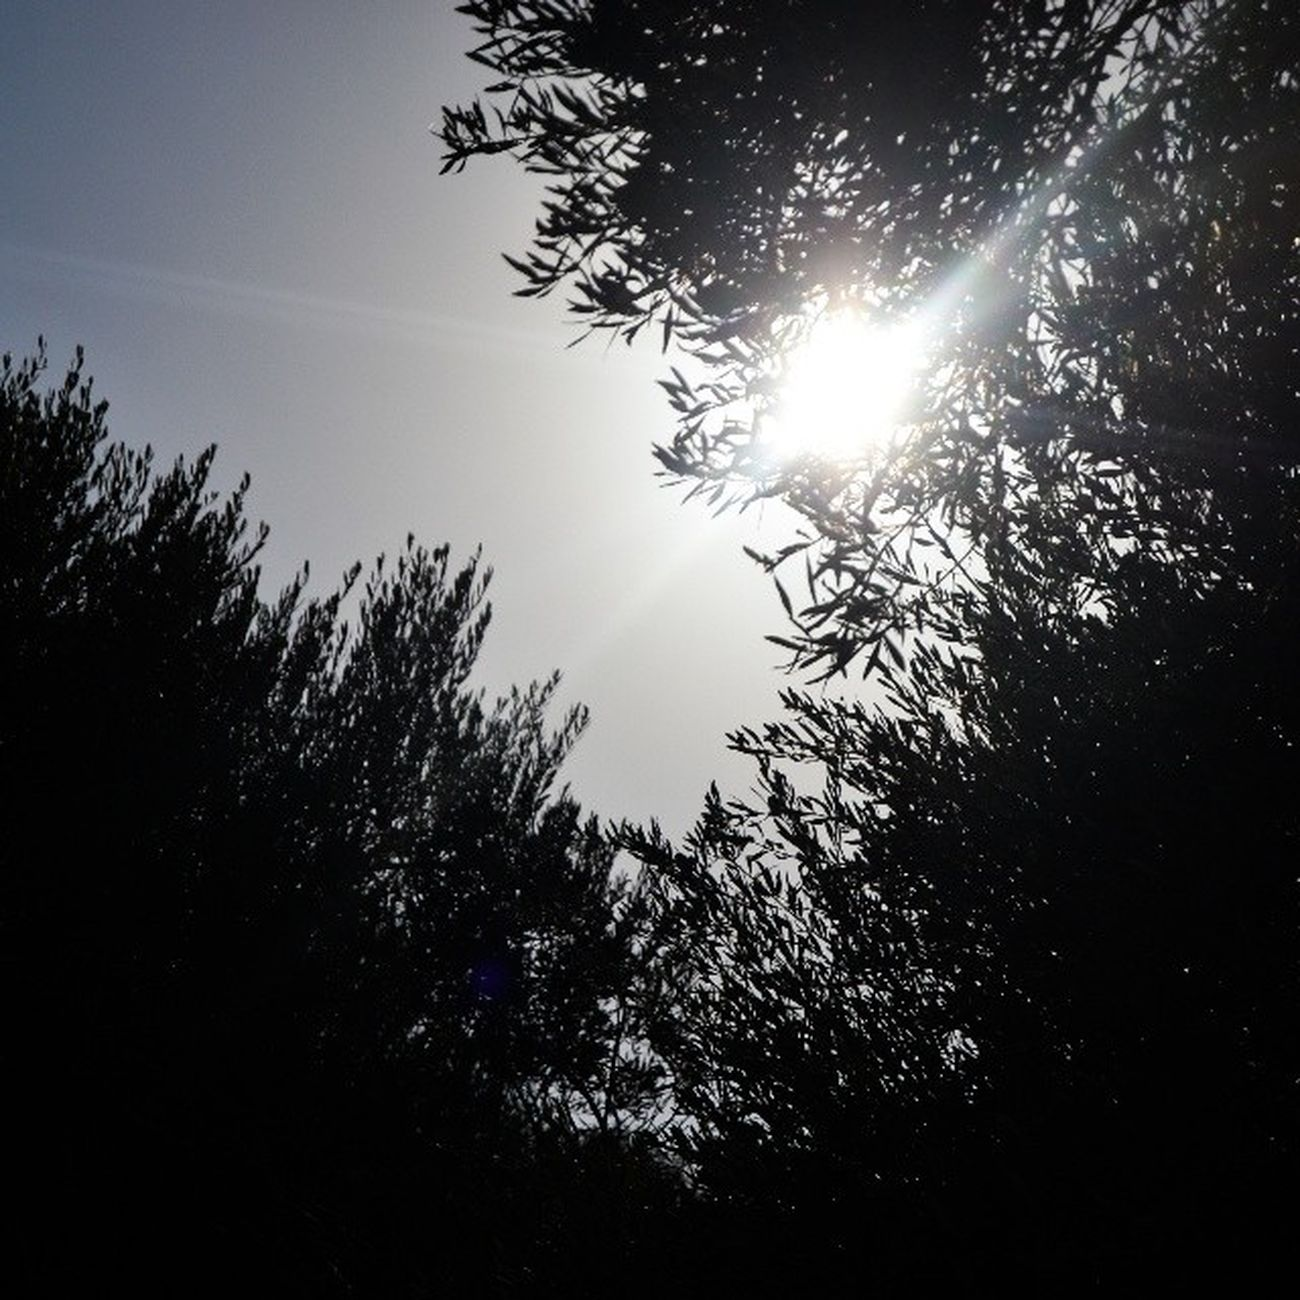 شروق الشمس شجر ورق_شجر عمان الاردن jordan discoverjo discoveramman seeamman beamman beautifuljordan beautifullamman beautifulnature sun sunrise sky_masters sky leaves trees spiritofjordan